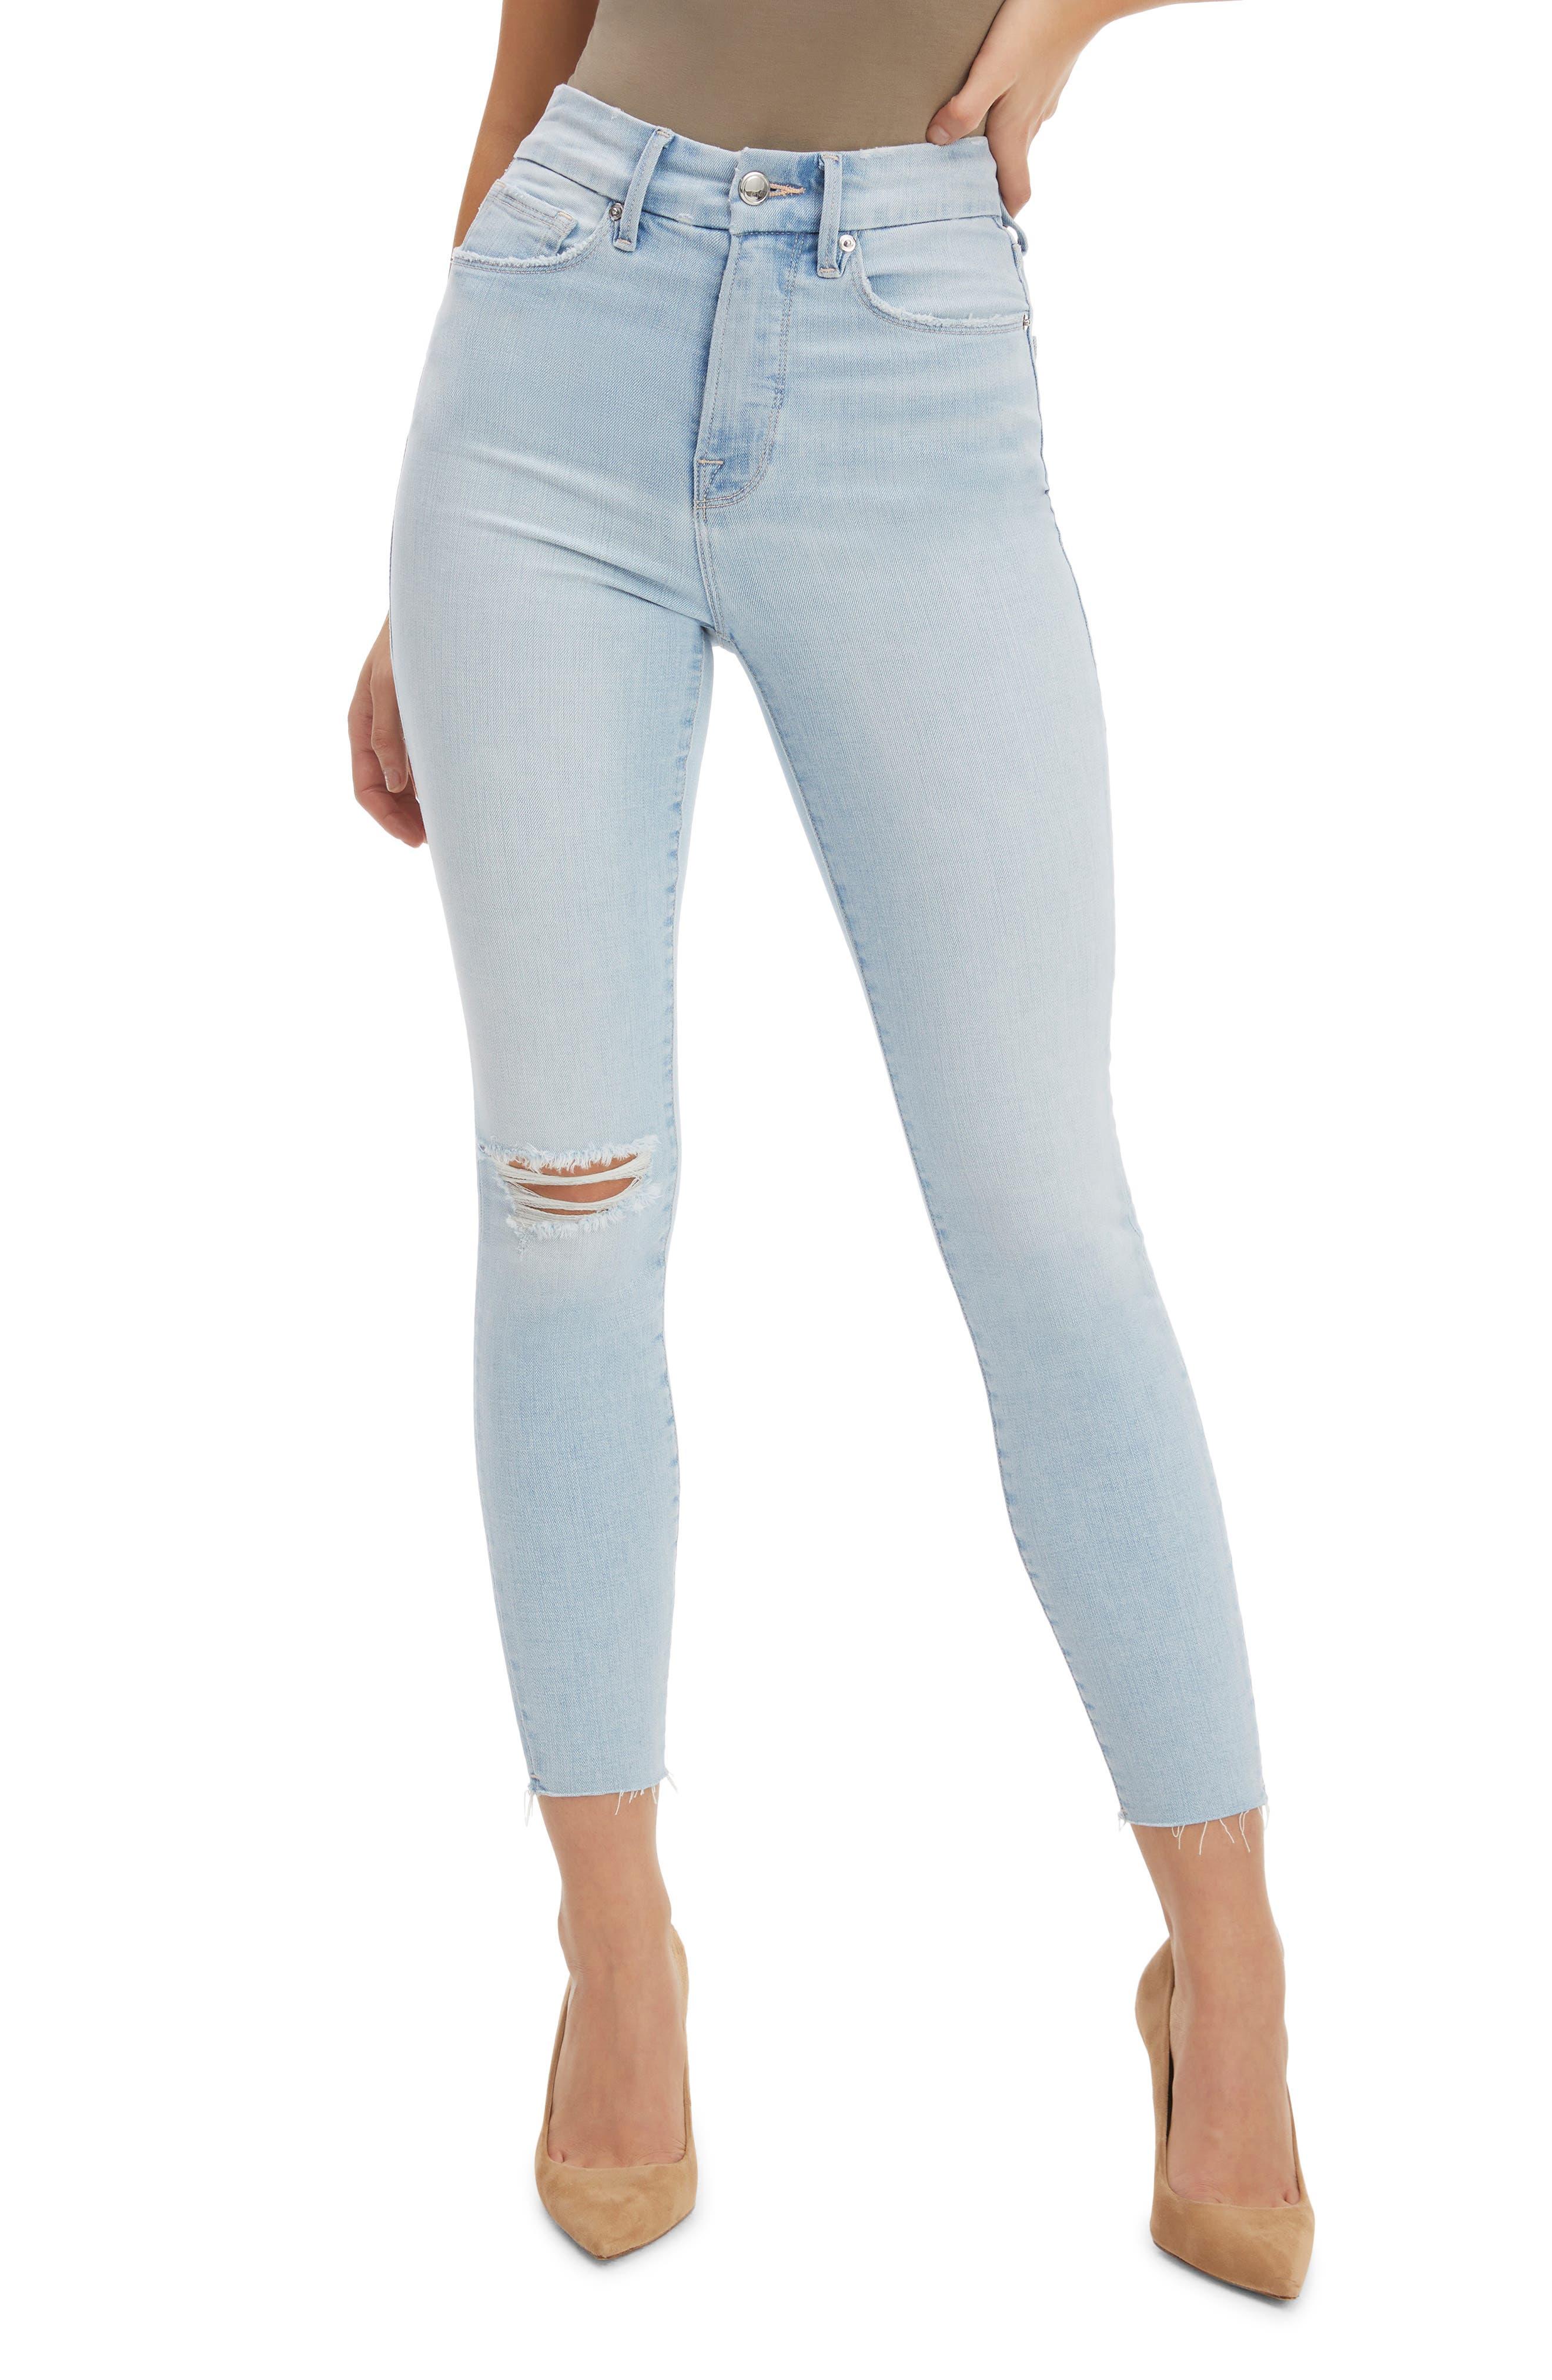 Women's Good American Good Waist Raw Edge Crop Skinny Jeans